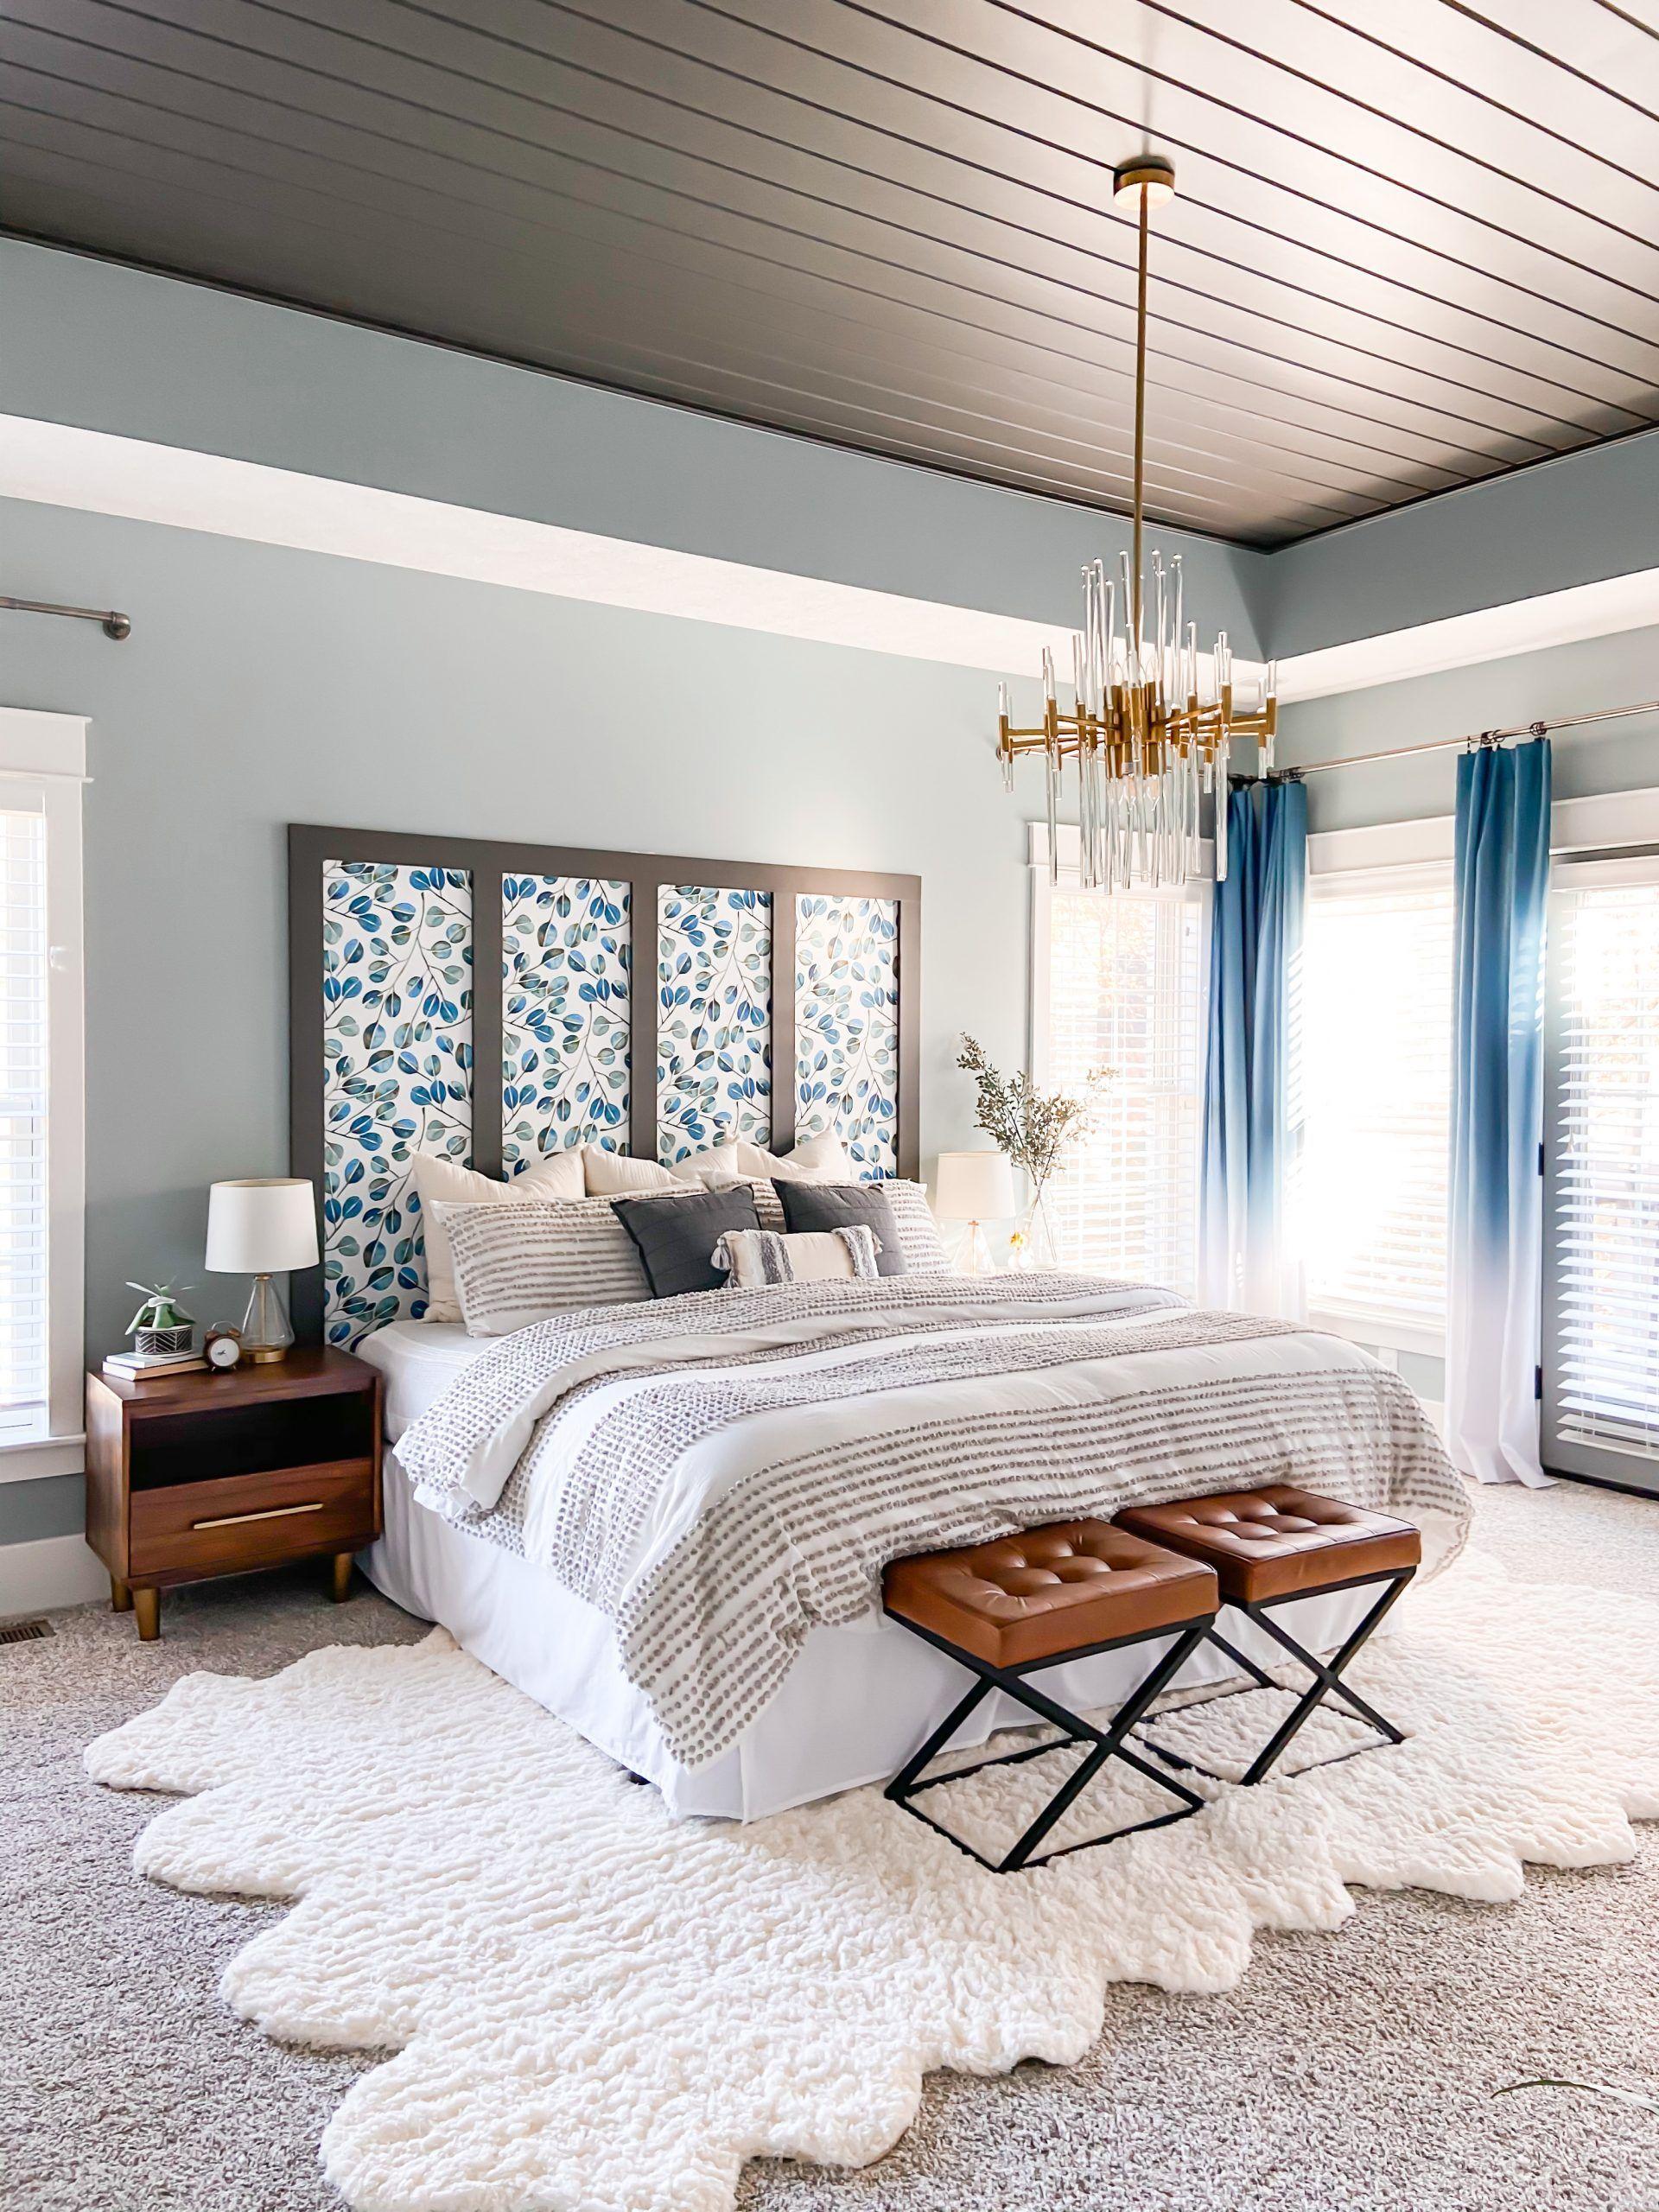 Master Bedroom Ideas With Urbane Bronze Bedroom Decor Cozy Bedroom Decor On A Budget Apartment Bedroom Decor